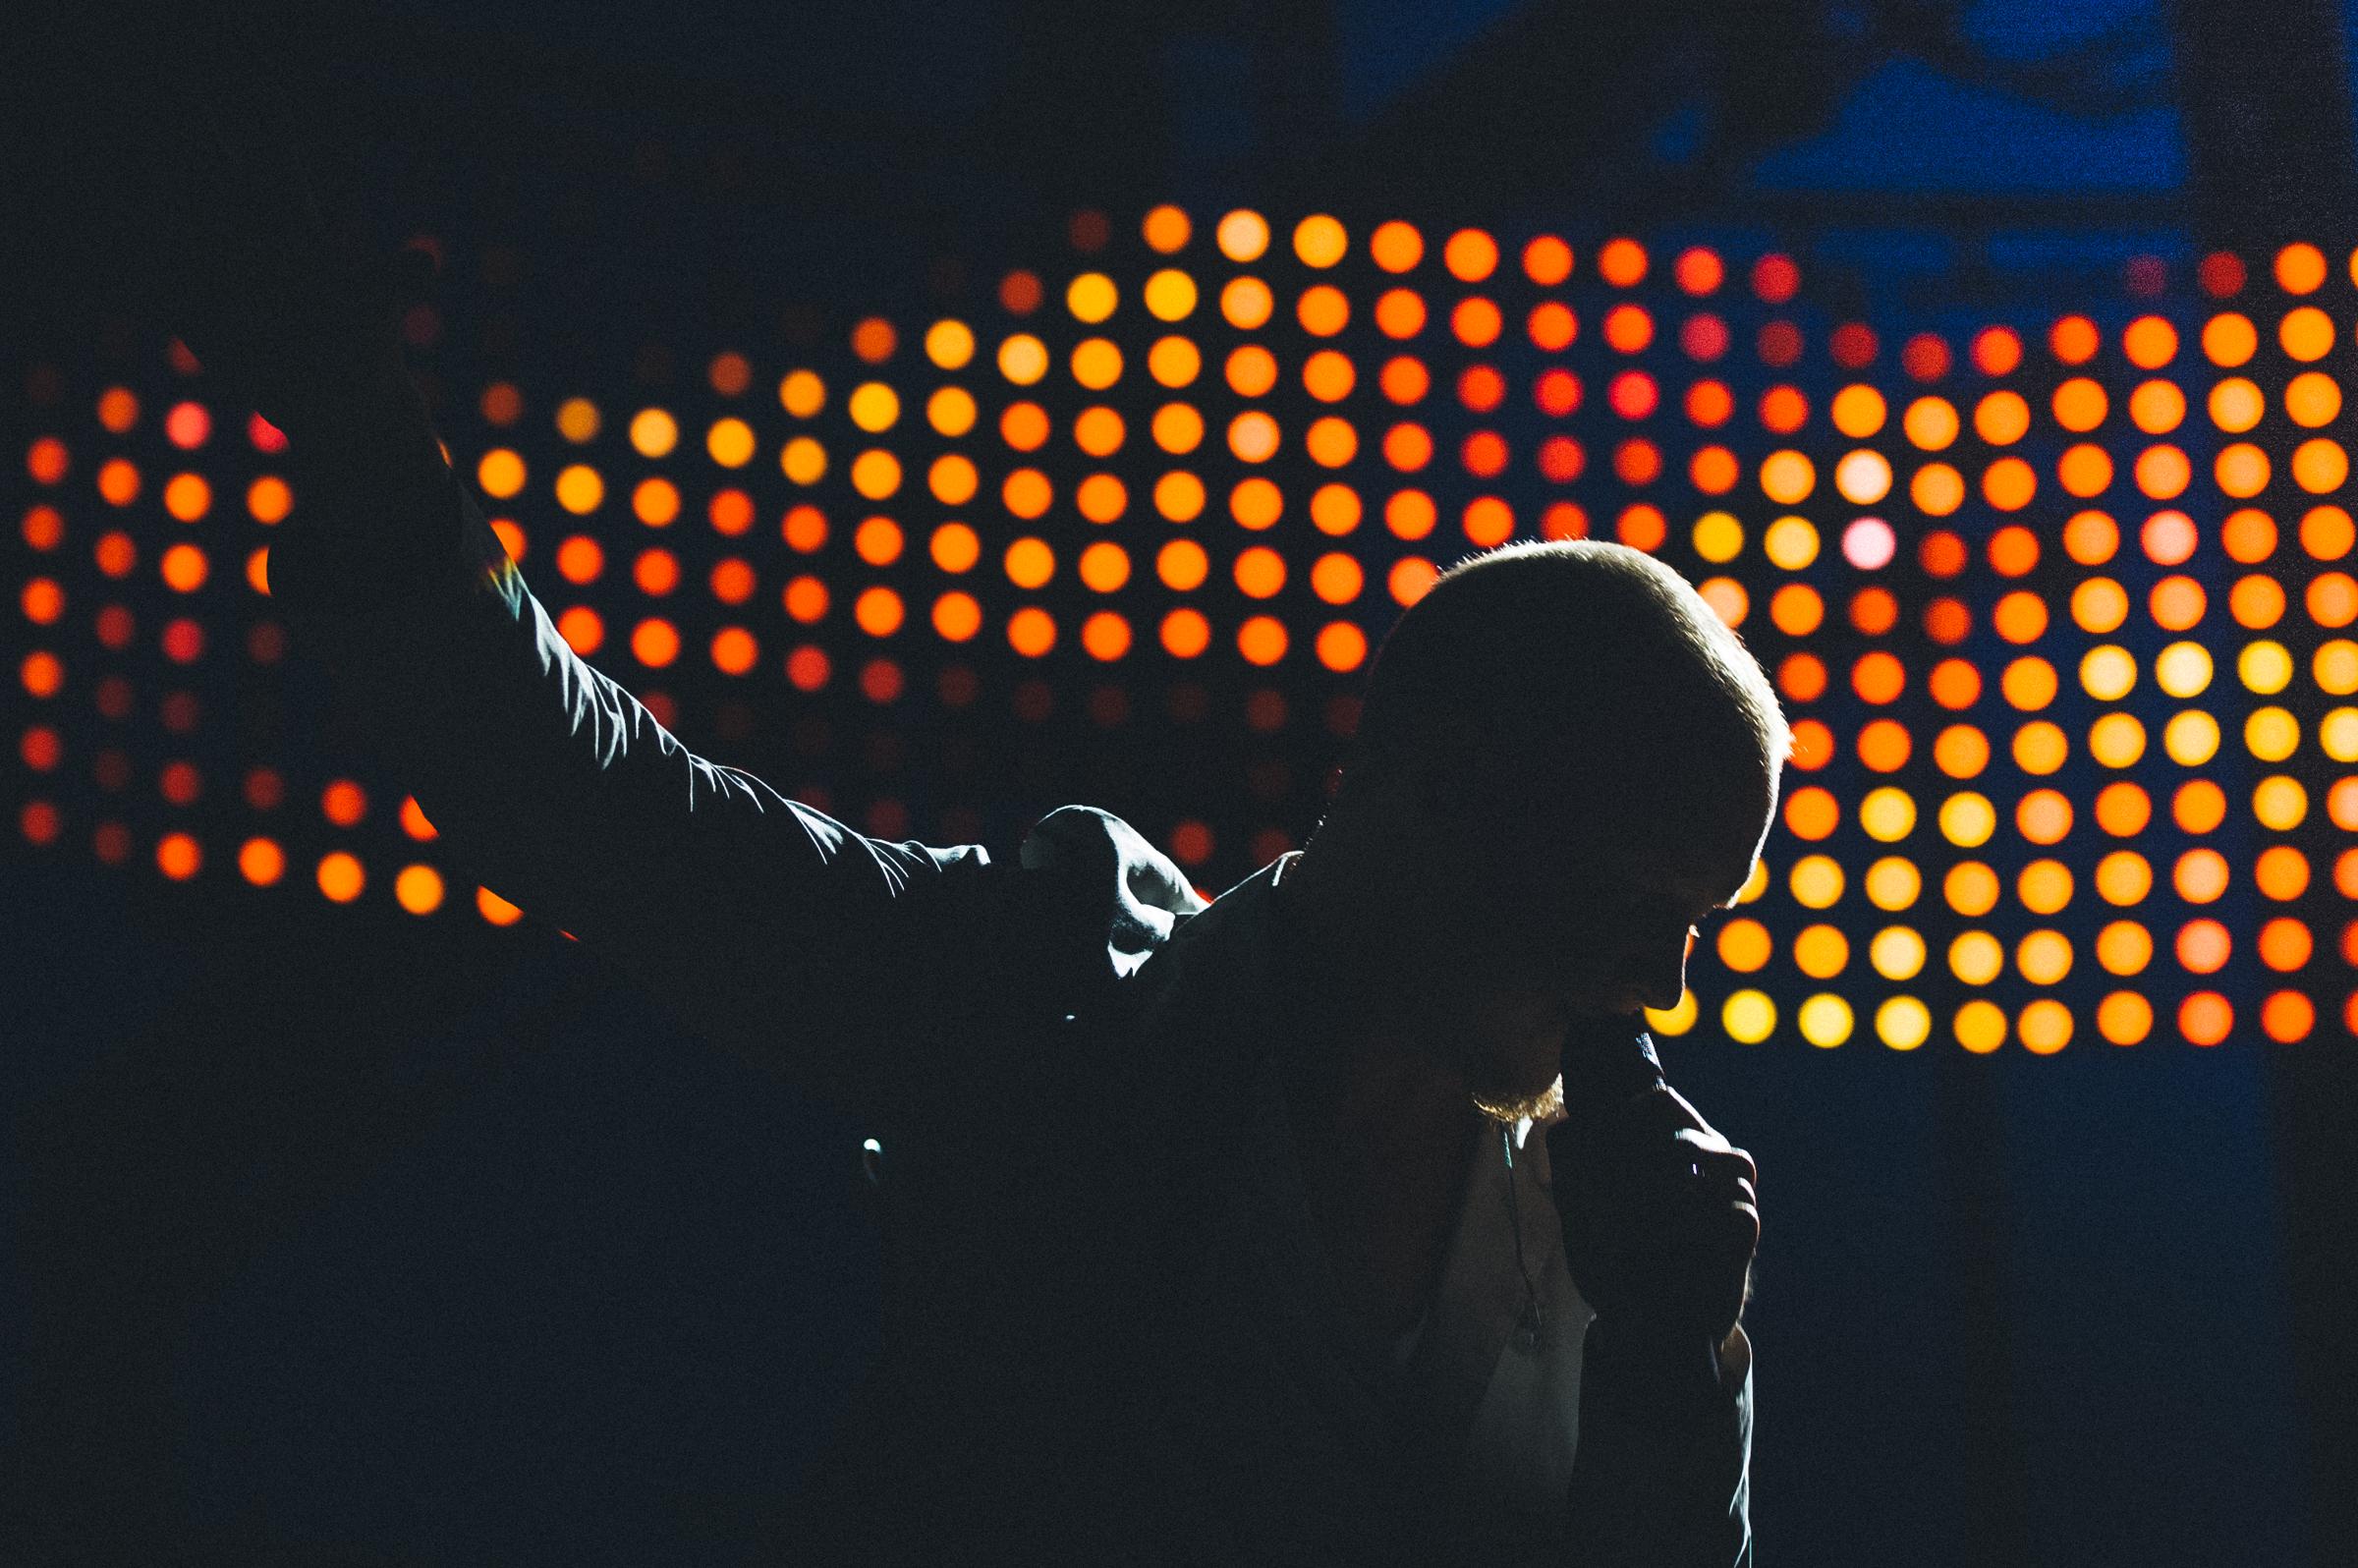 ChadFahnestockPhotography_Concert-049.jpg